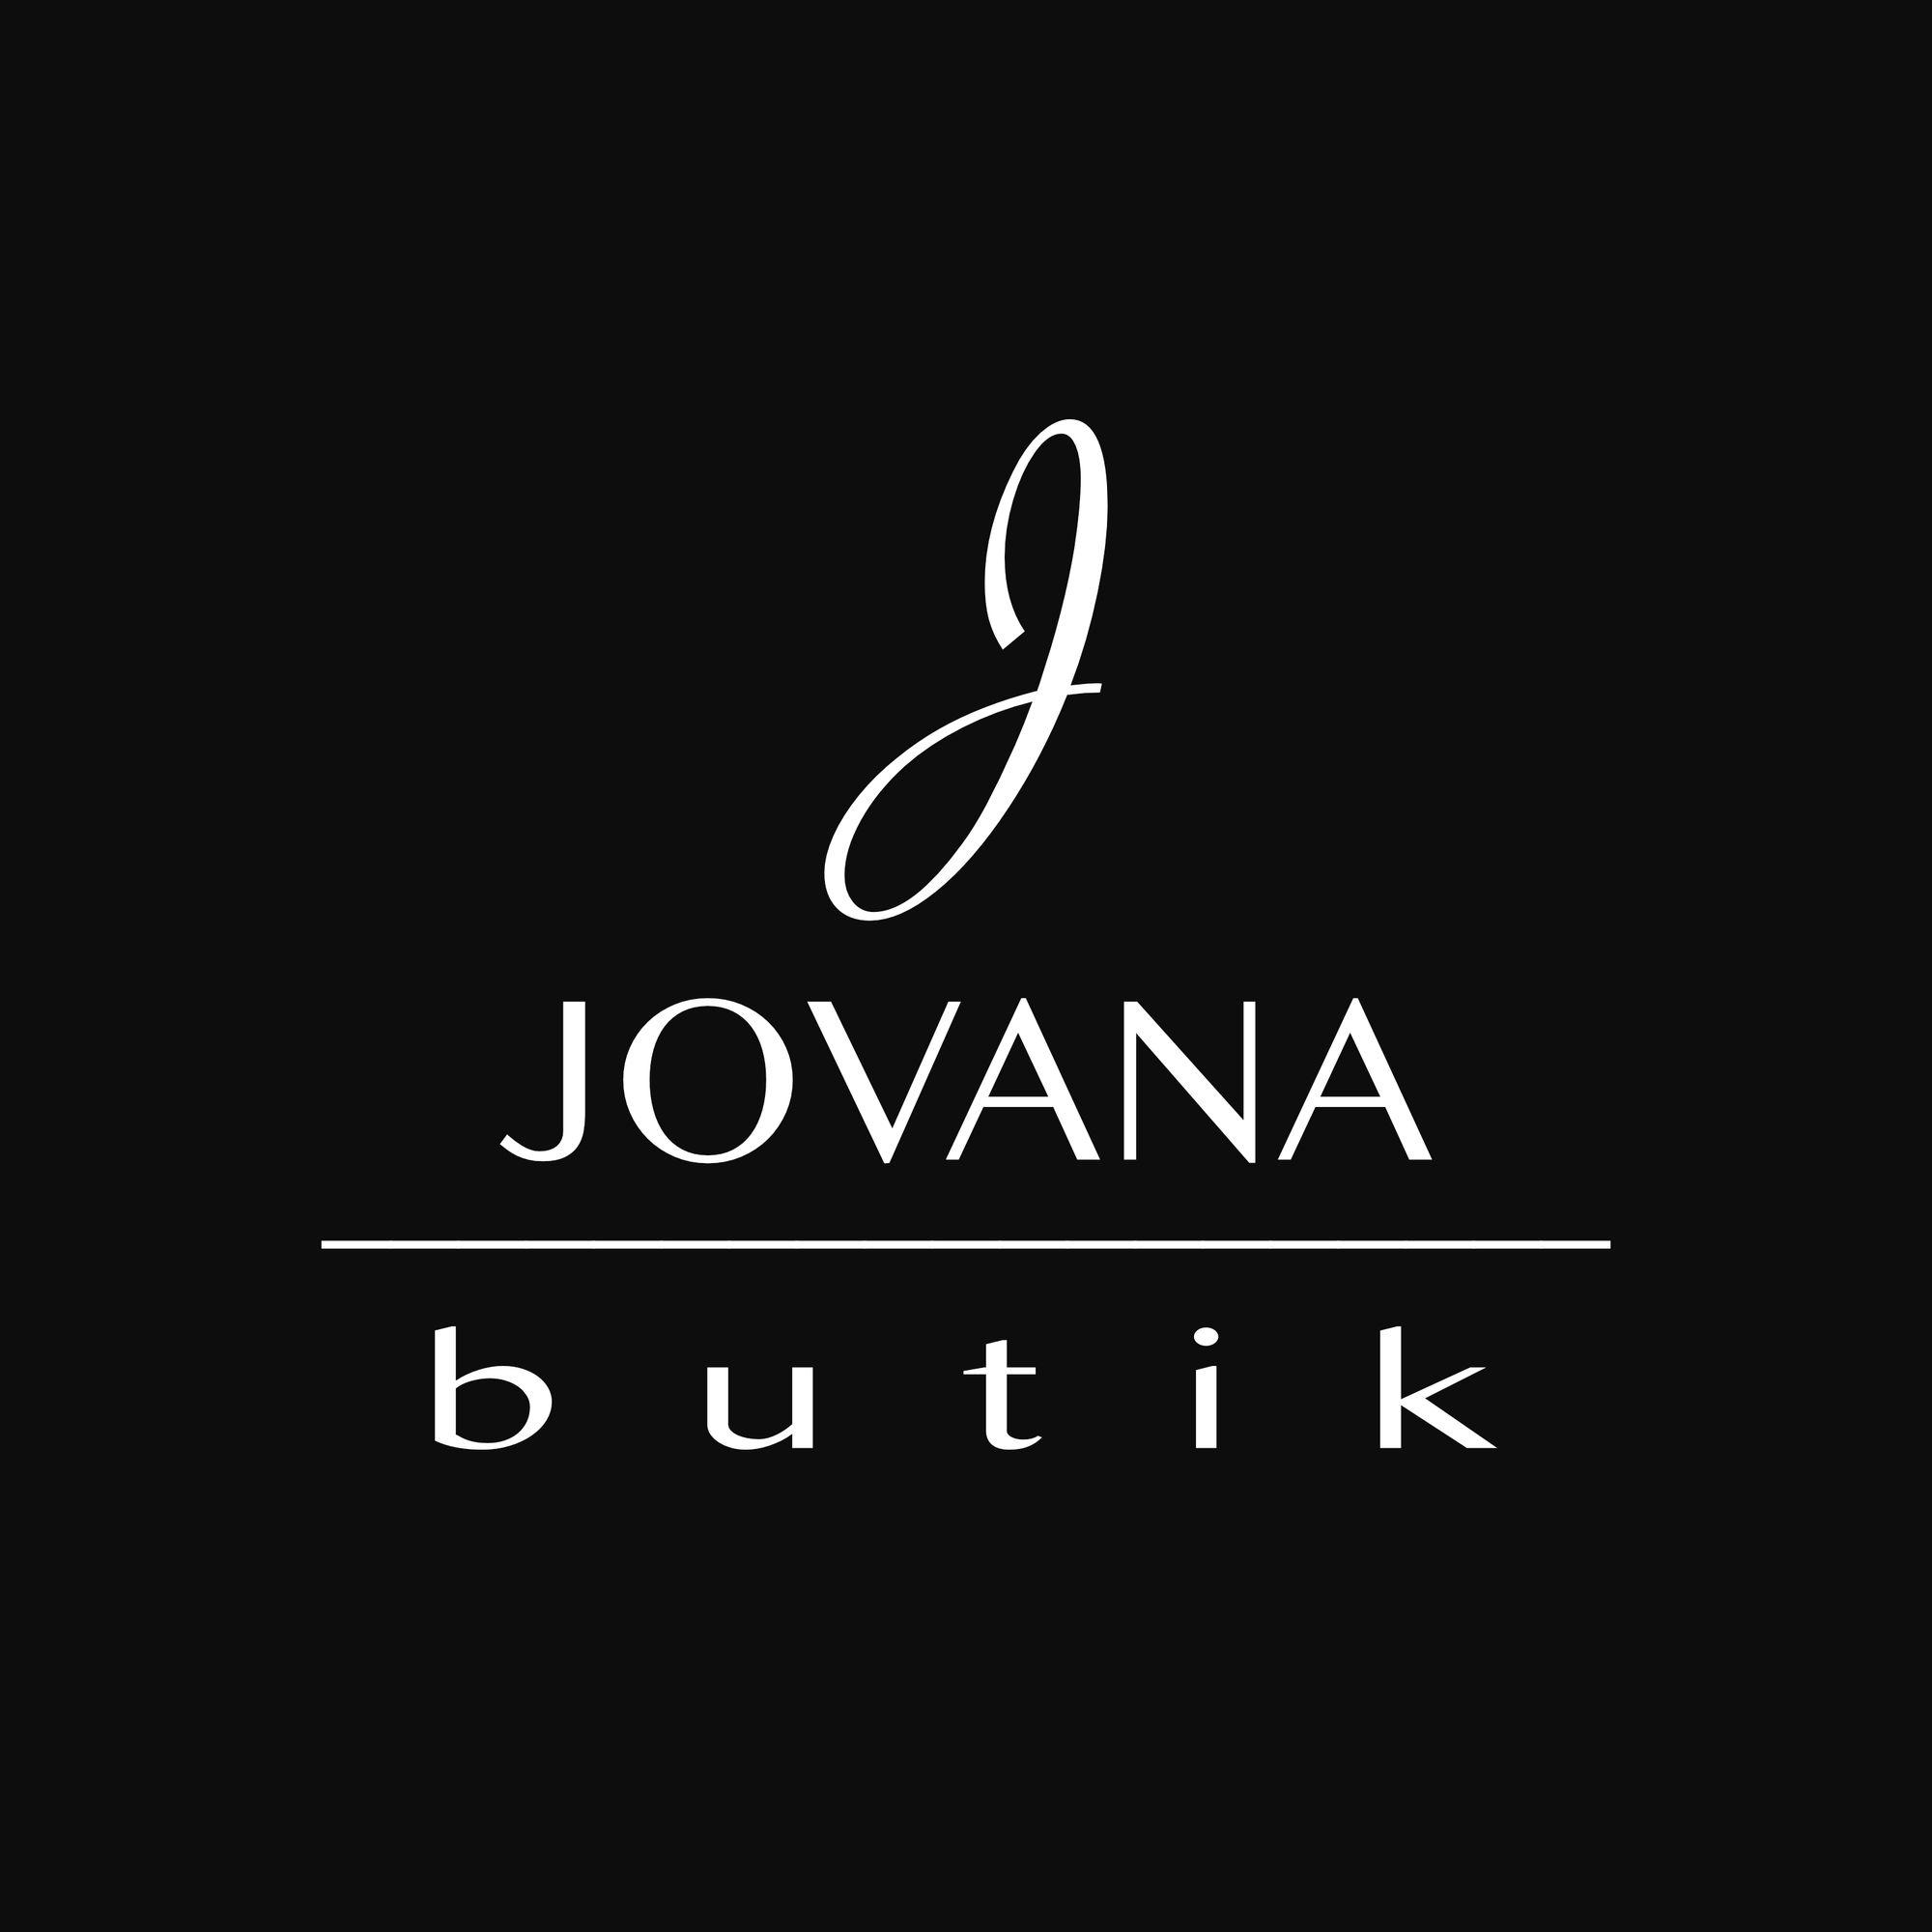 Butik Jovana